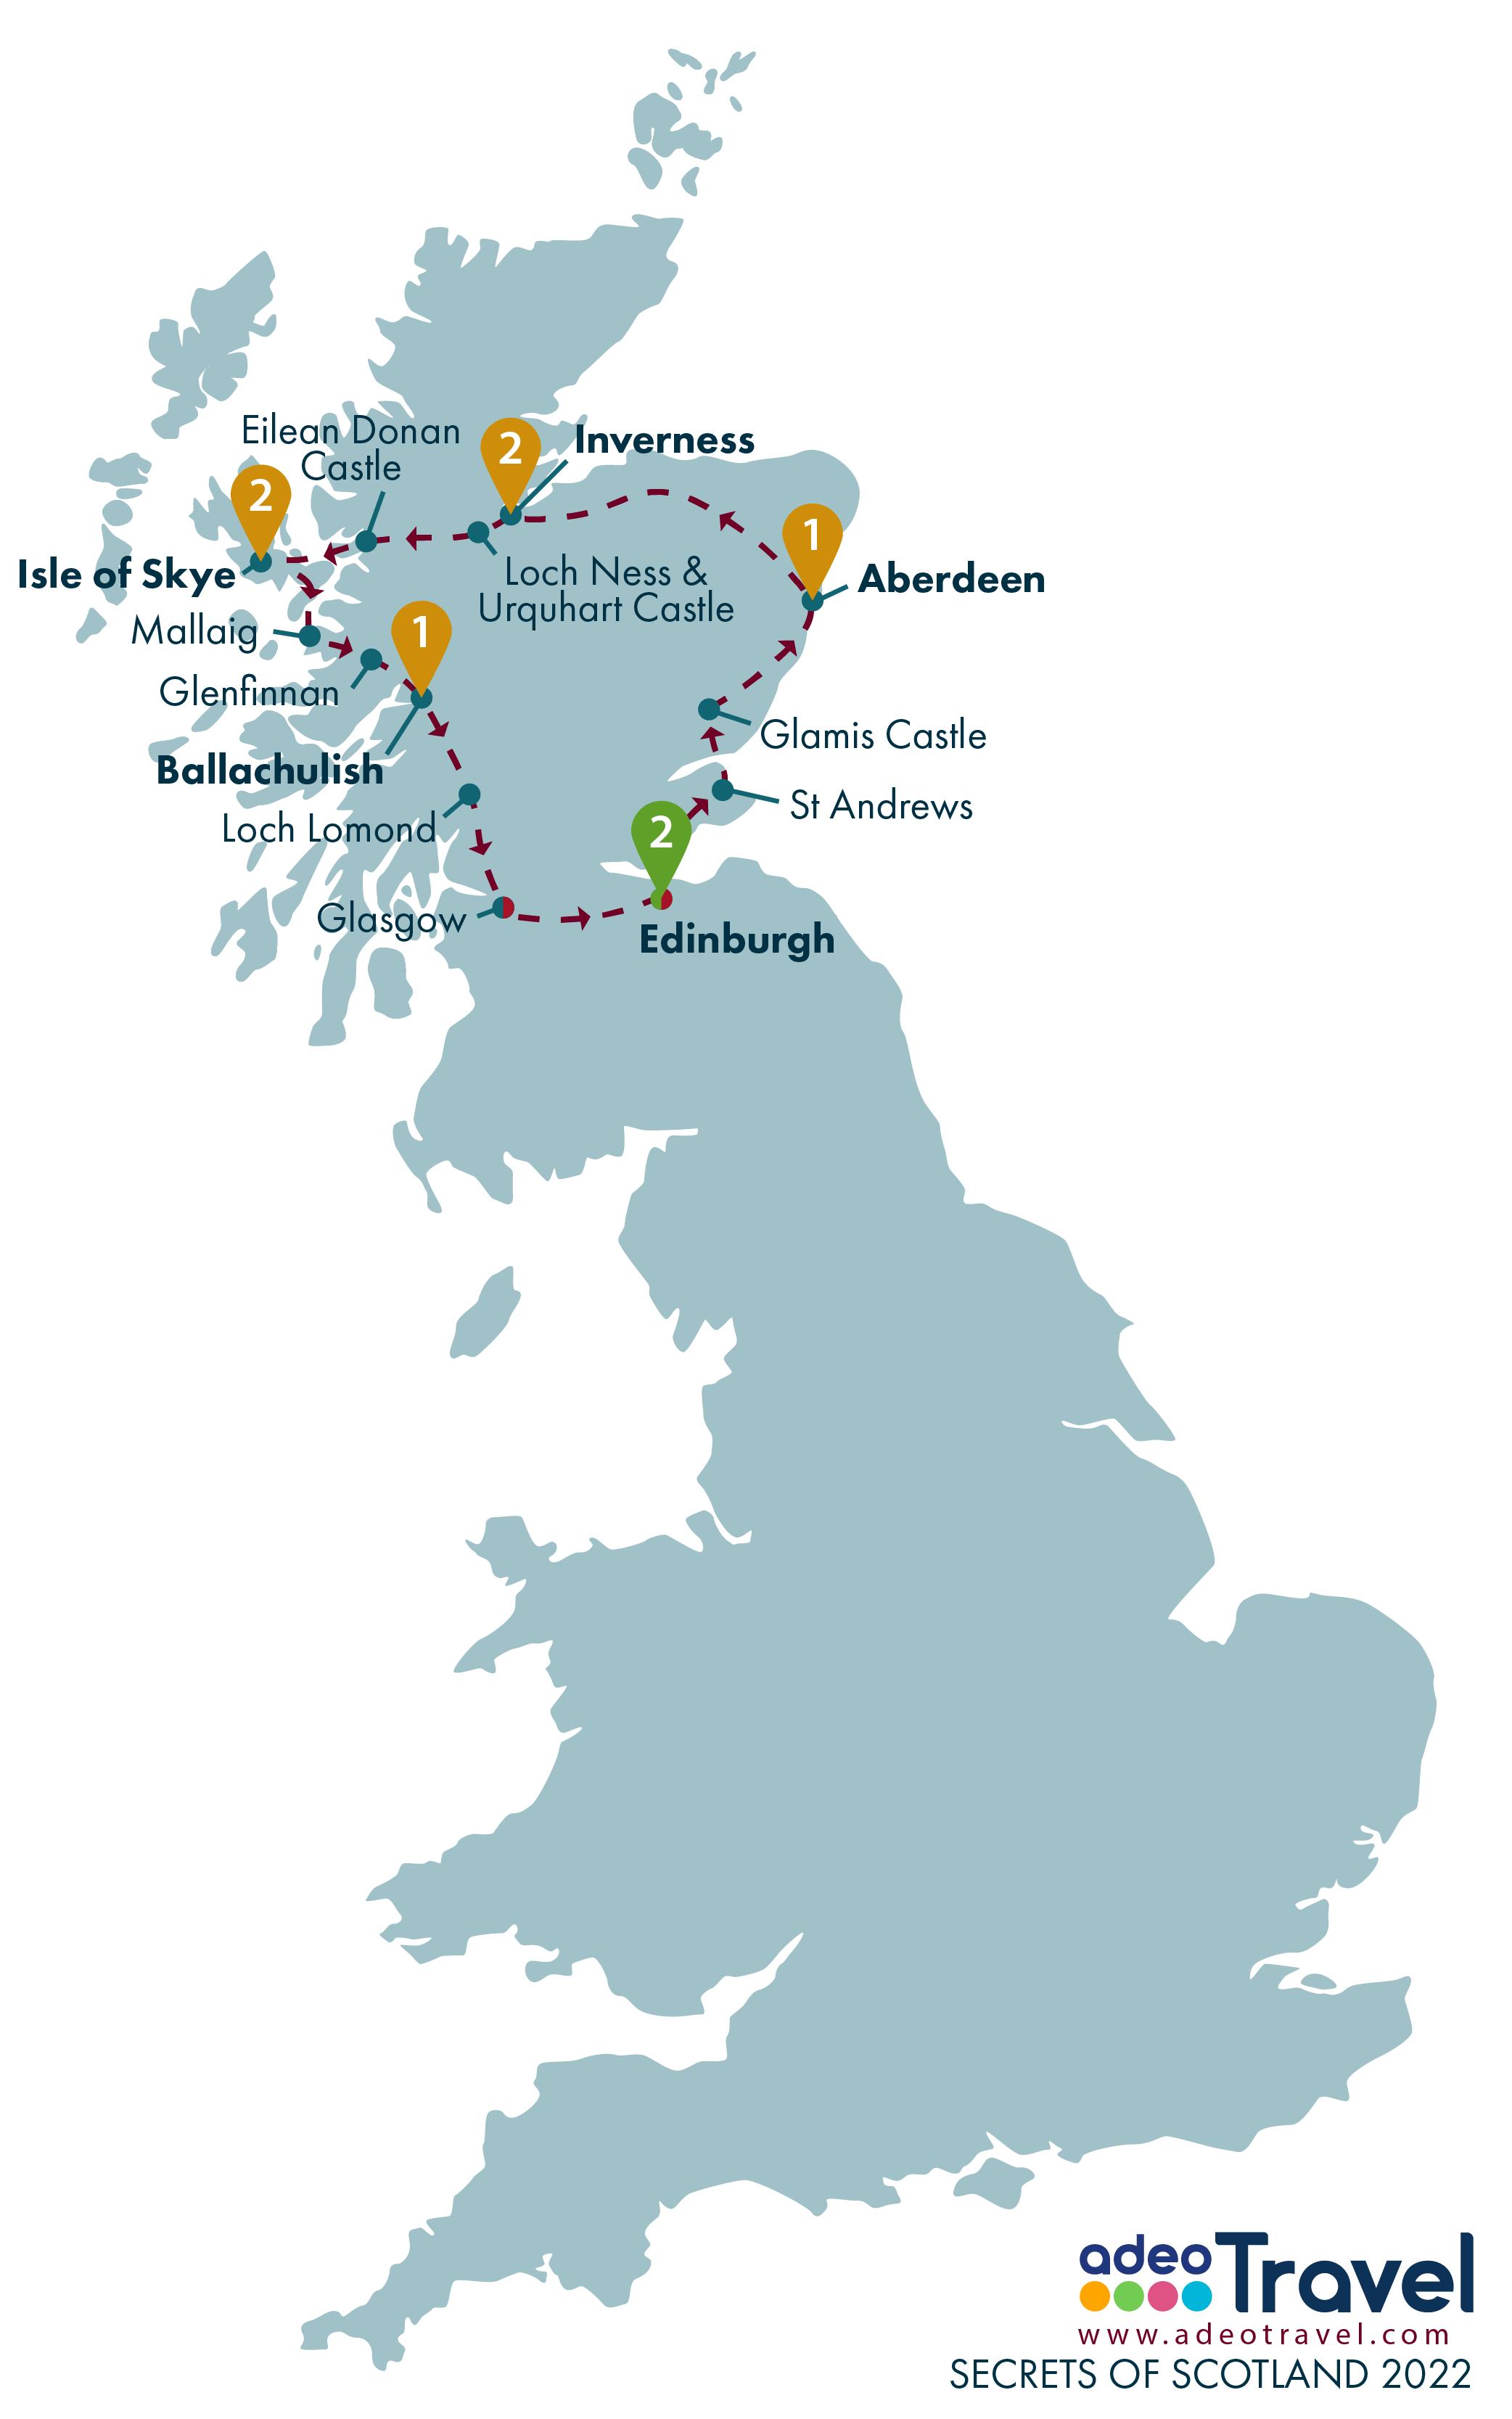 Map - Secrets of Scotland 2022